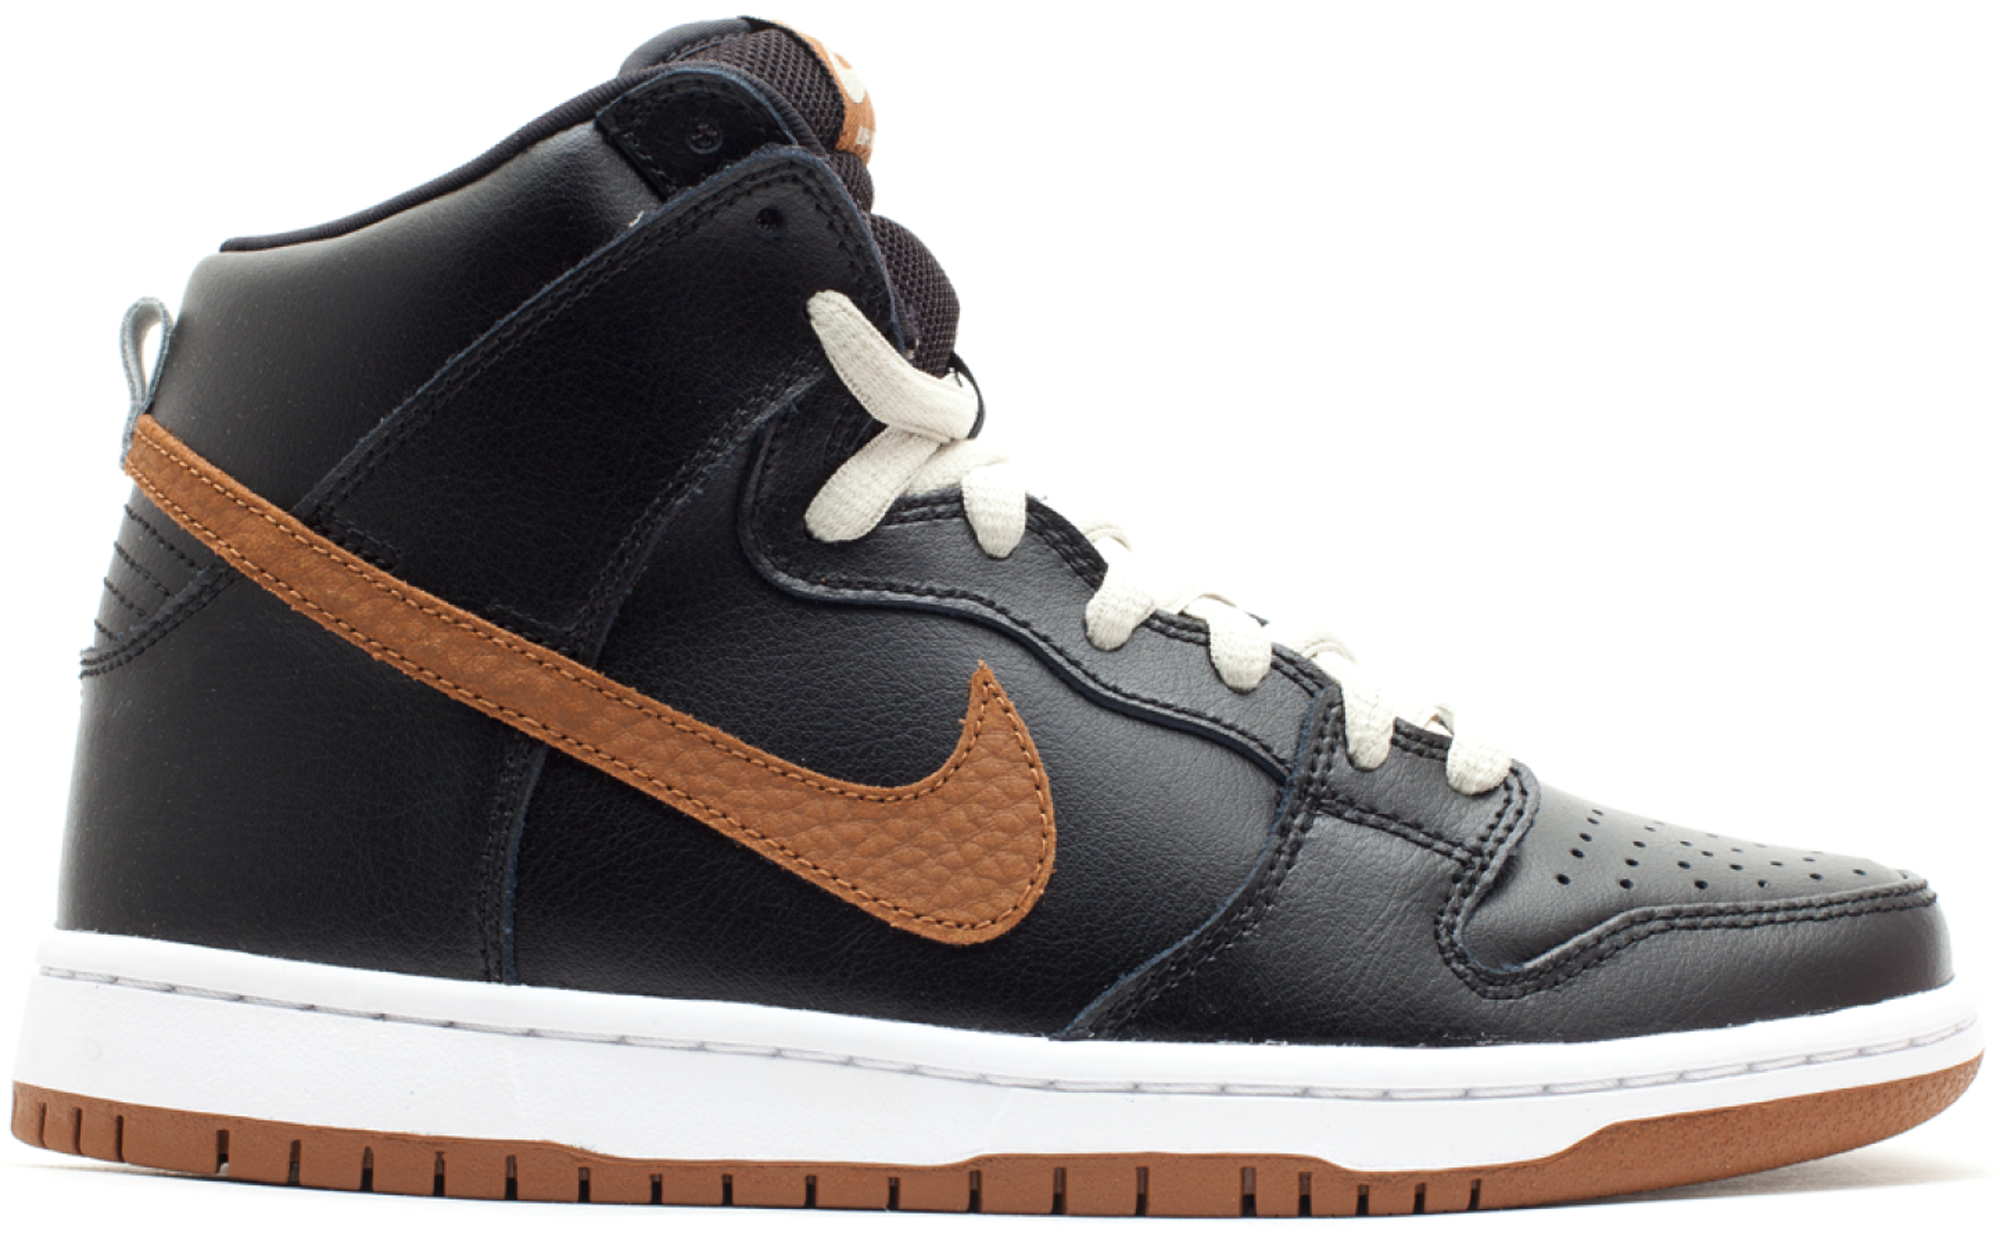 Nike SB Dunk High Guiness